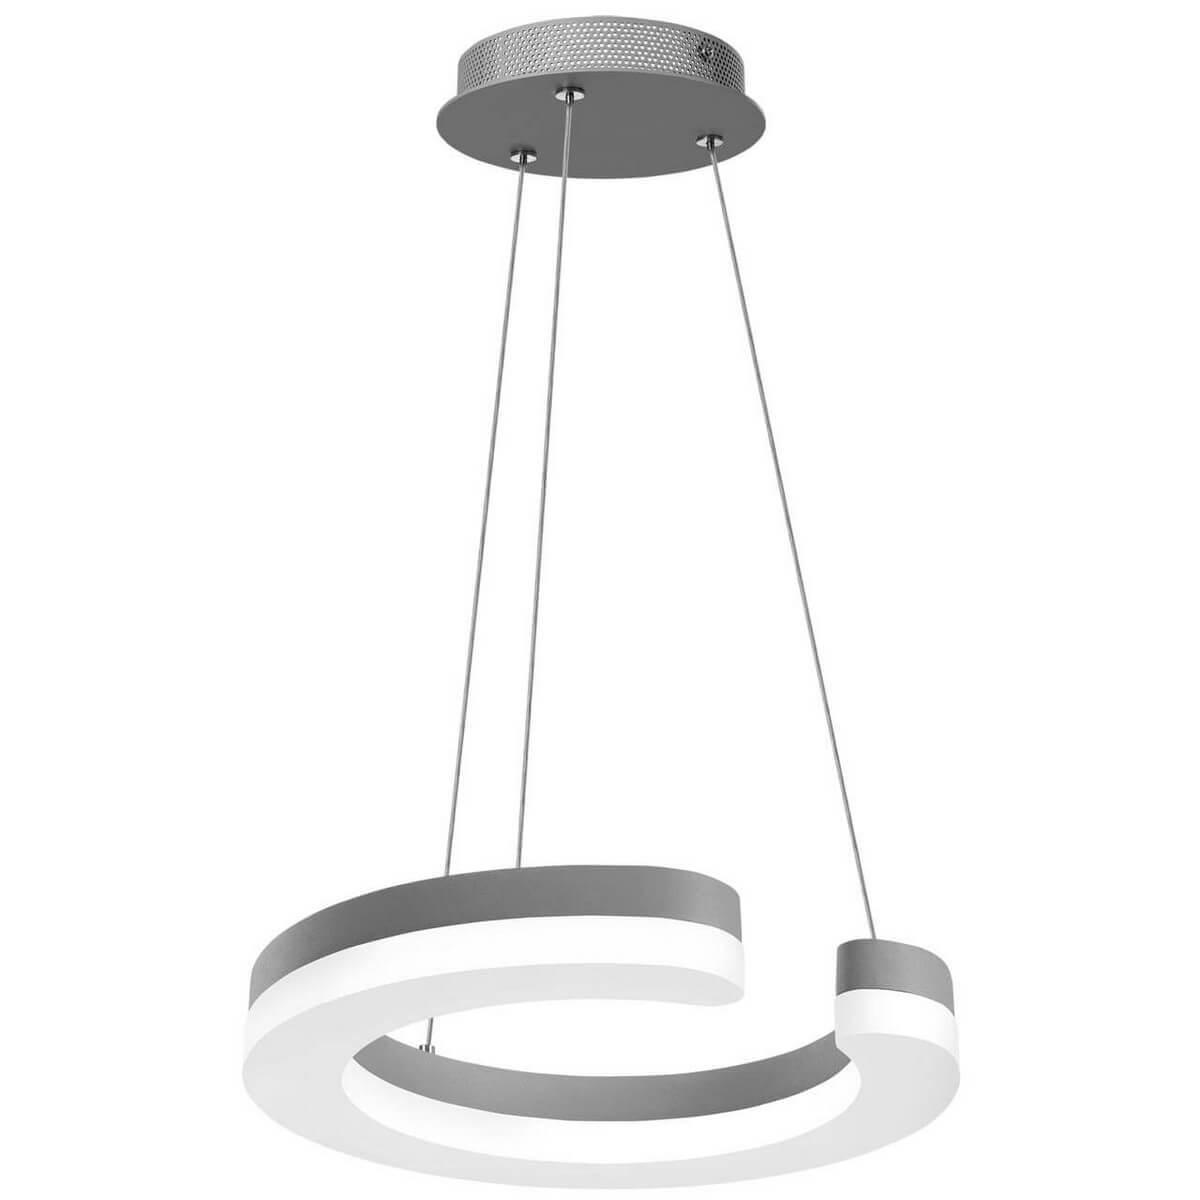 Светильник Lightstar 763139 Unitario подвесной светильник unitario 763246